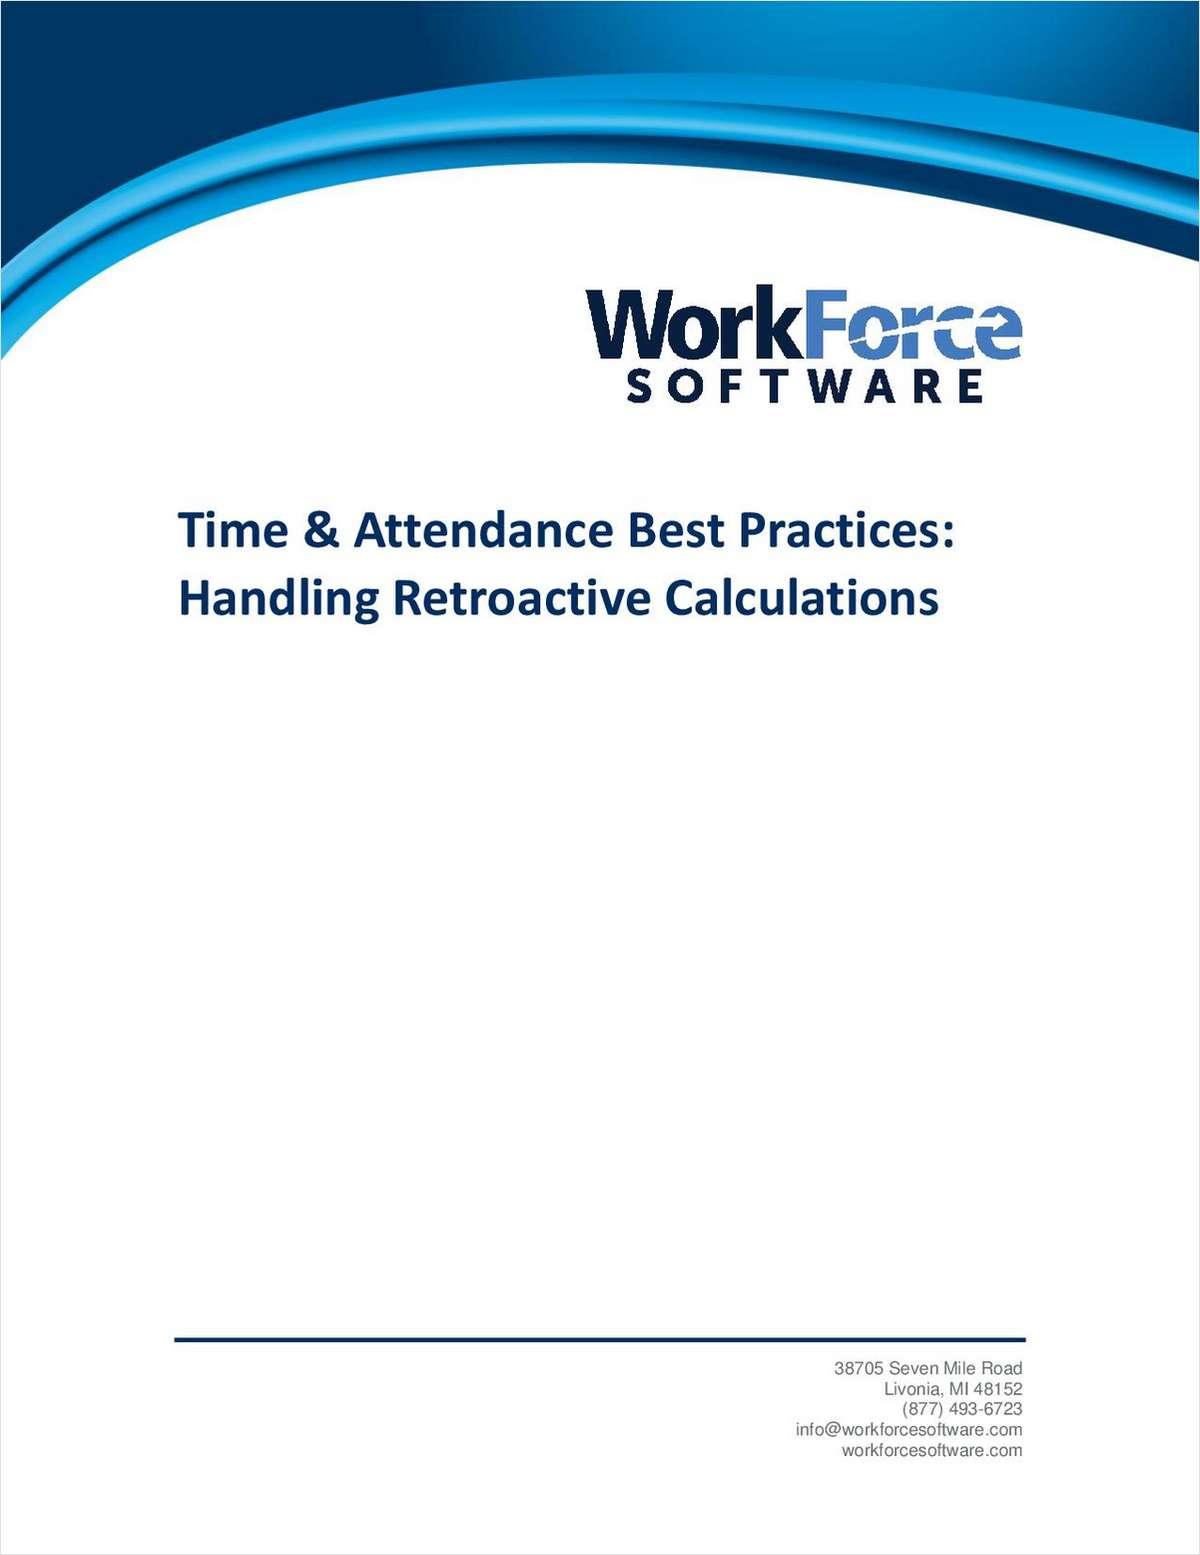 Time & Attendance Best Practices: Handling Retroactive Calculations